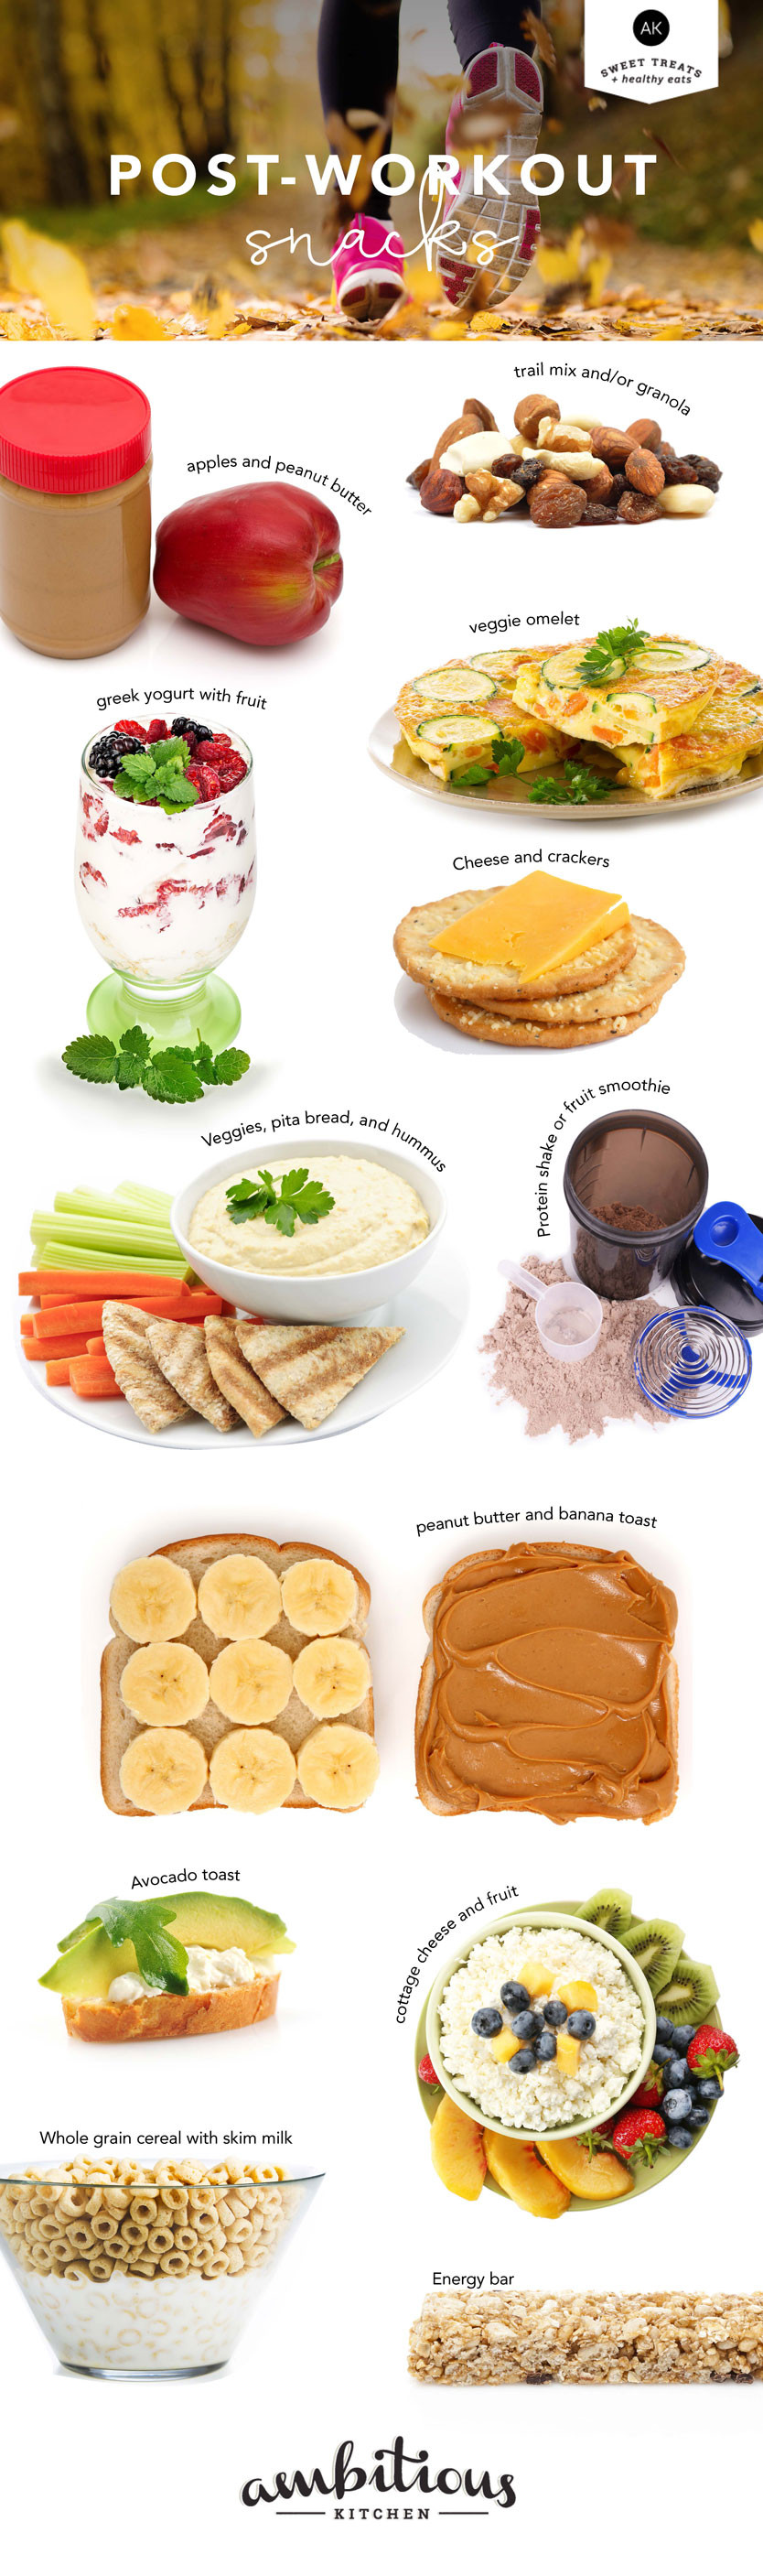 Healthy Post Workout Snacks  Wellness Wednesday 12 Healthy Post Workout Snacks When